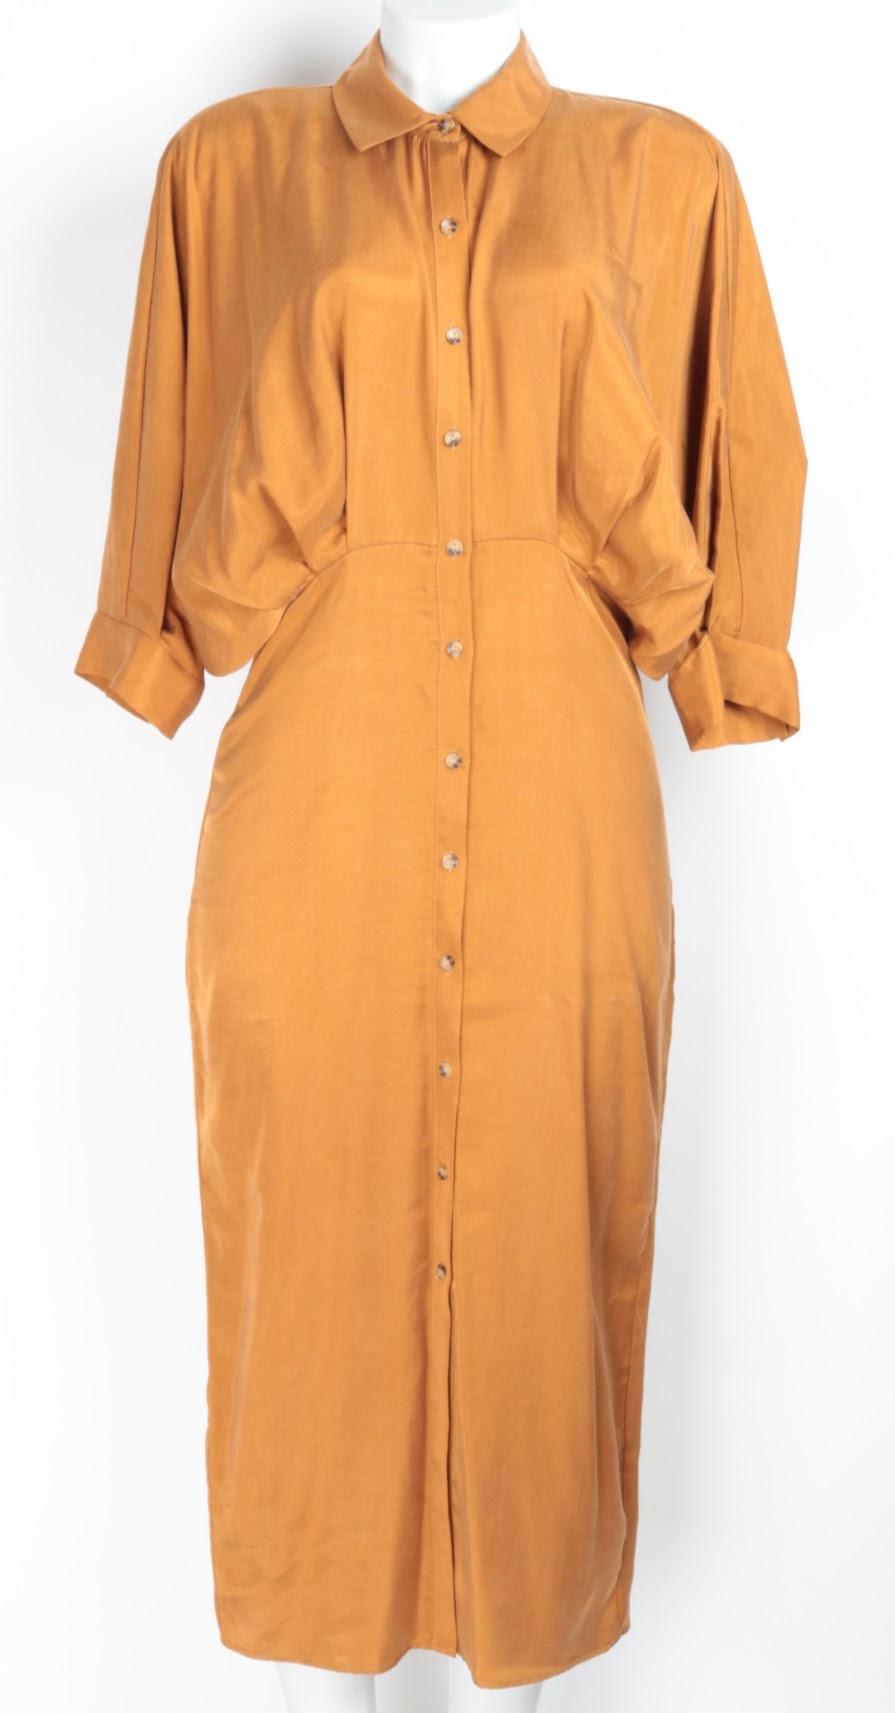 Vestido Longo - Zara - M